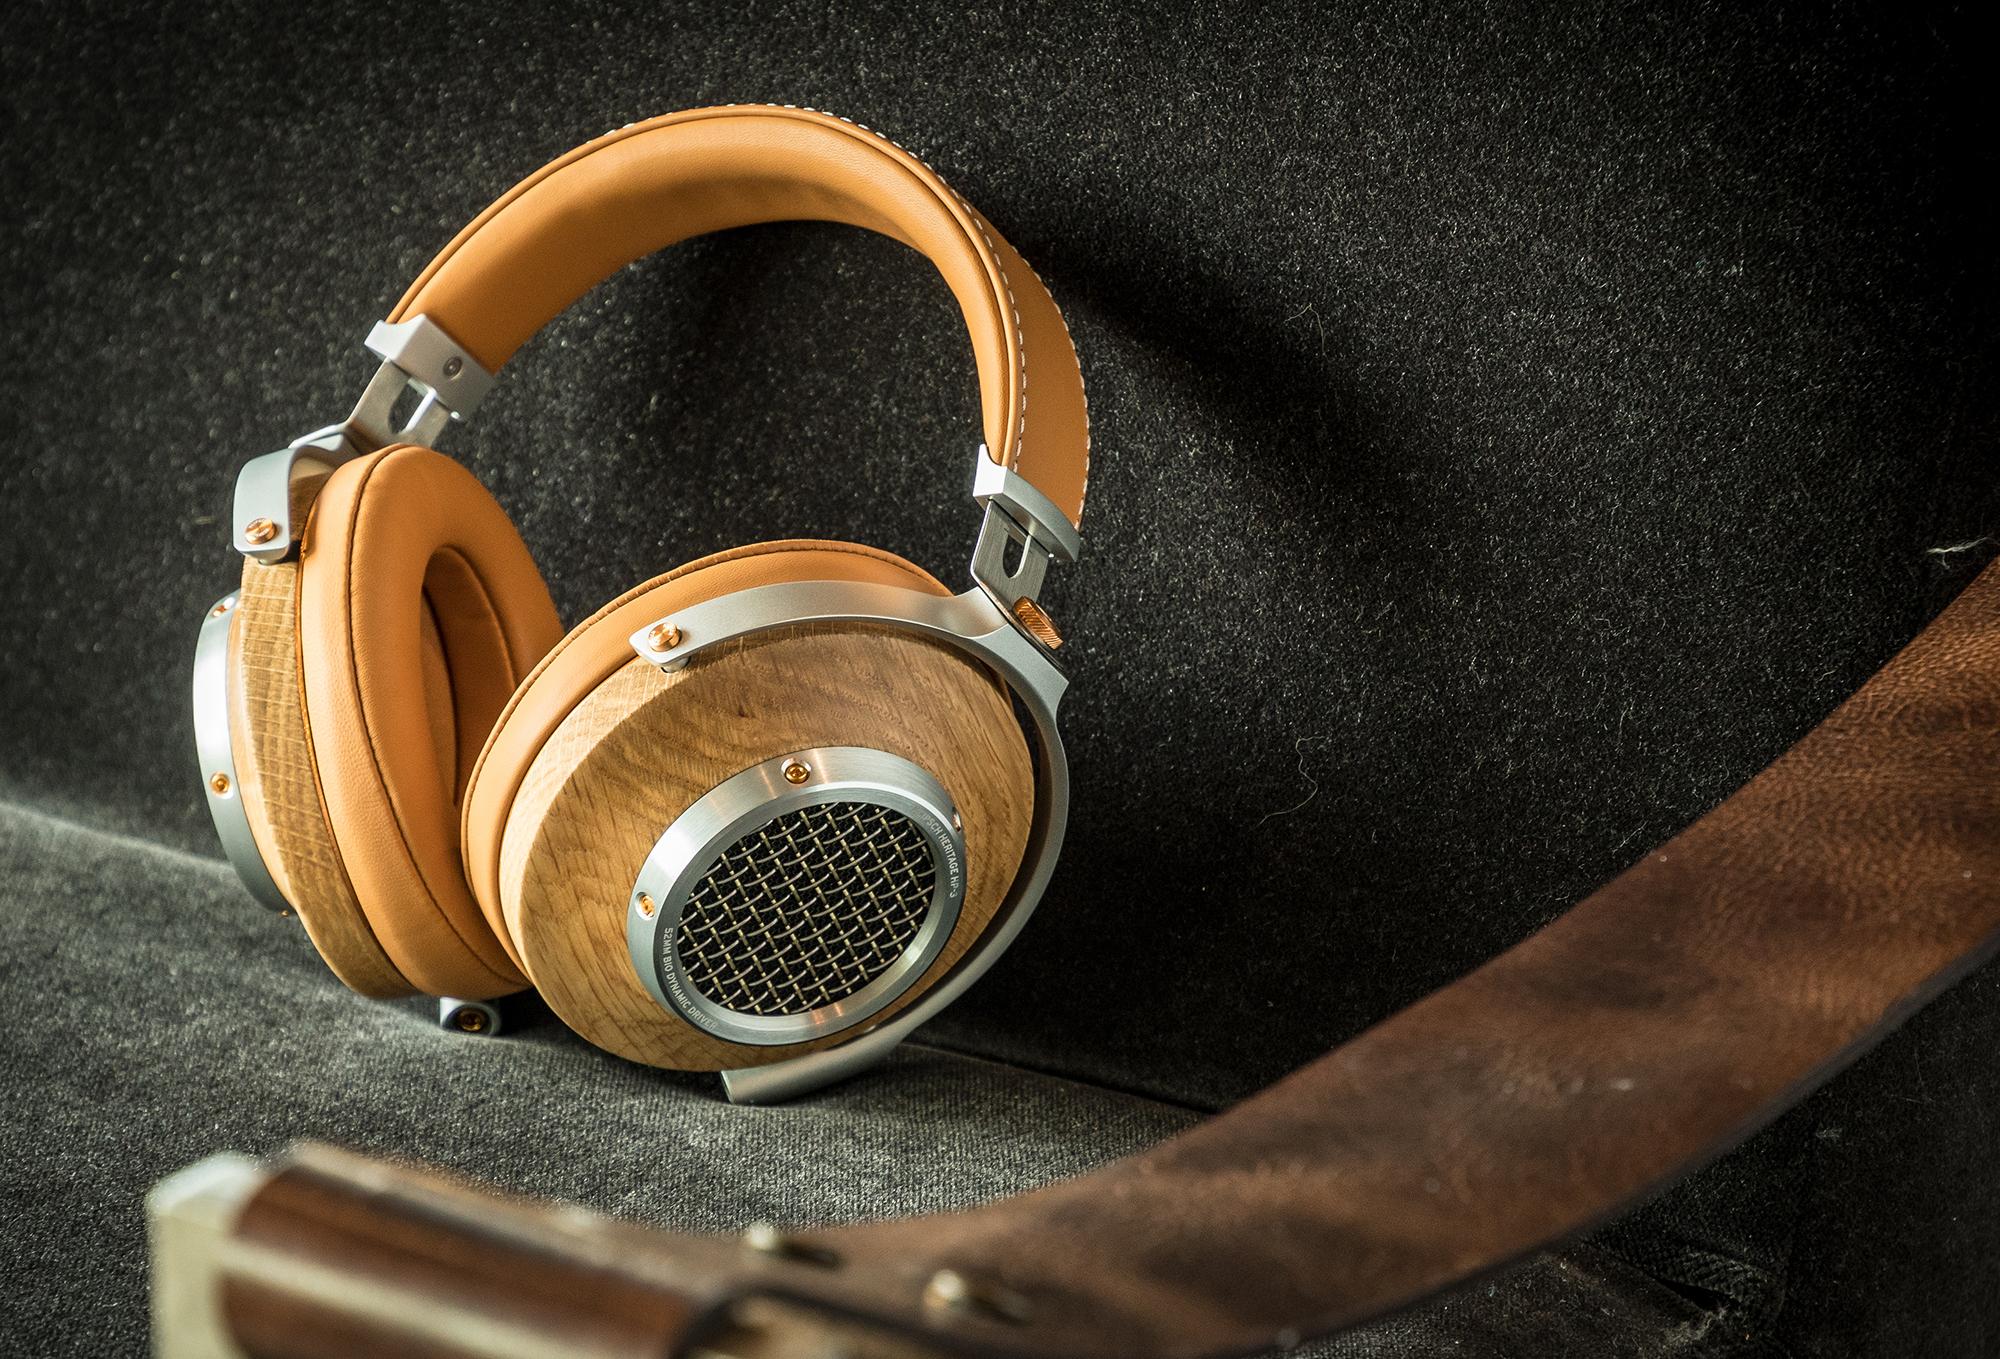 fuse box headphones upgrading to breaker box fuse box heritage hp 3 headphones klipsch